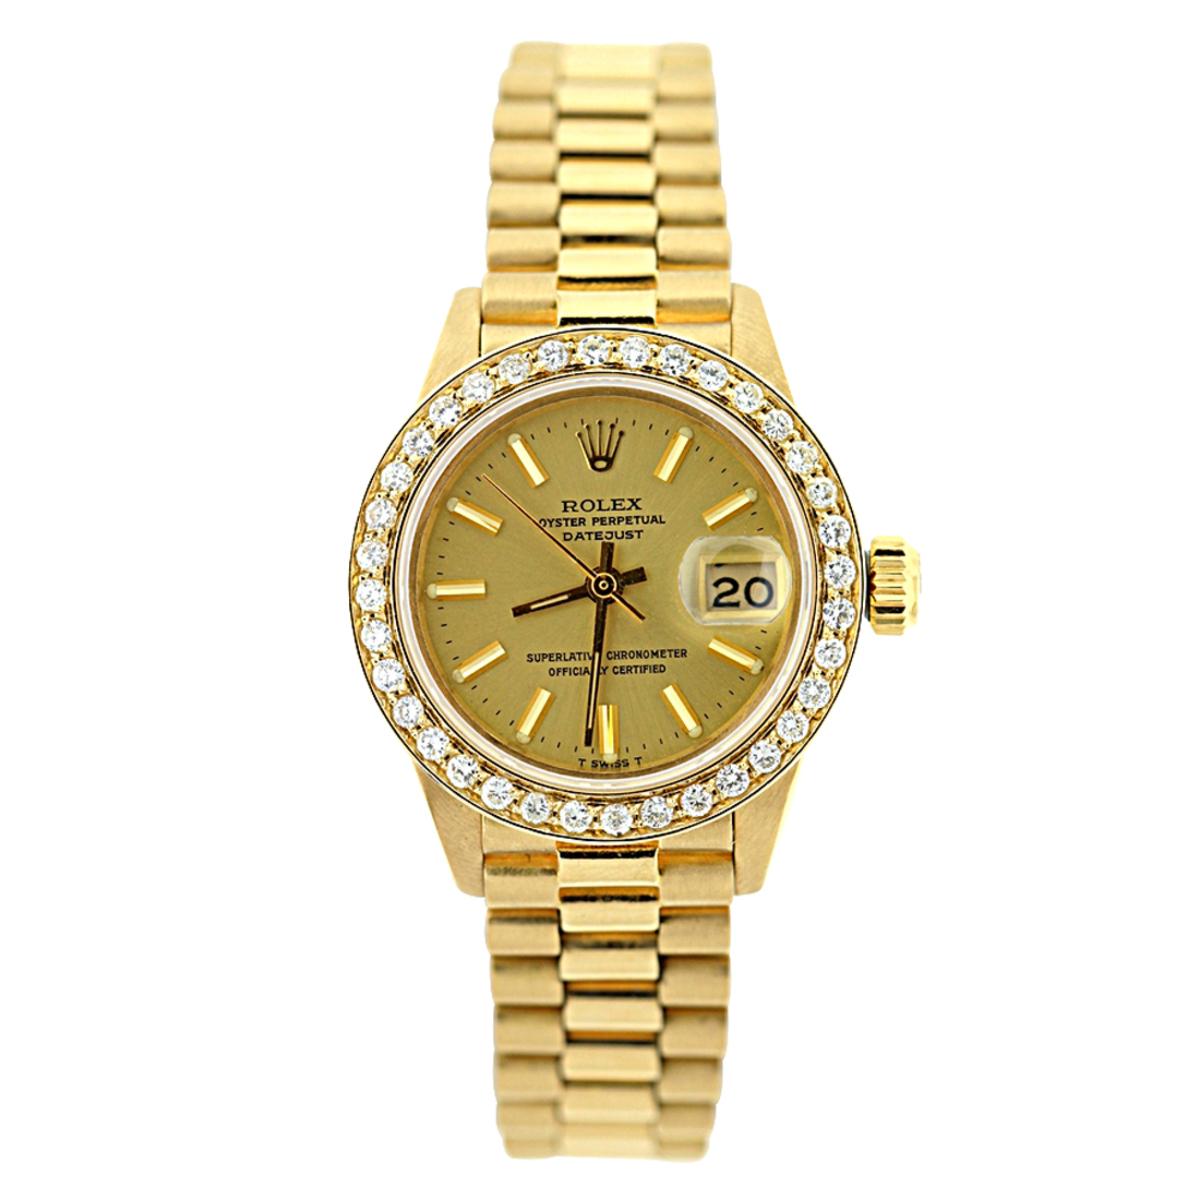 18K Gold Rolex Presidential Datejust Ladies Diamond Watch 1.2ct